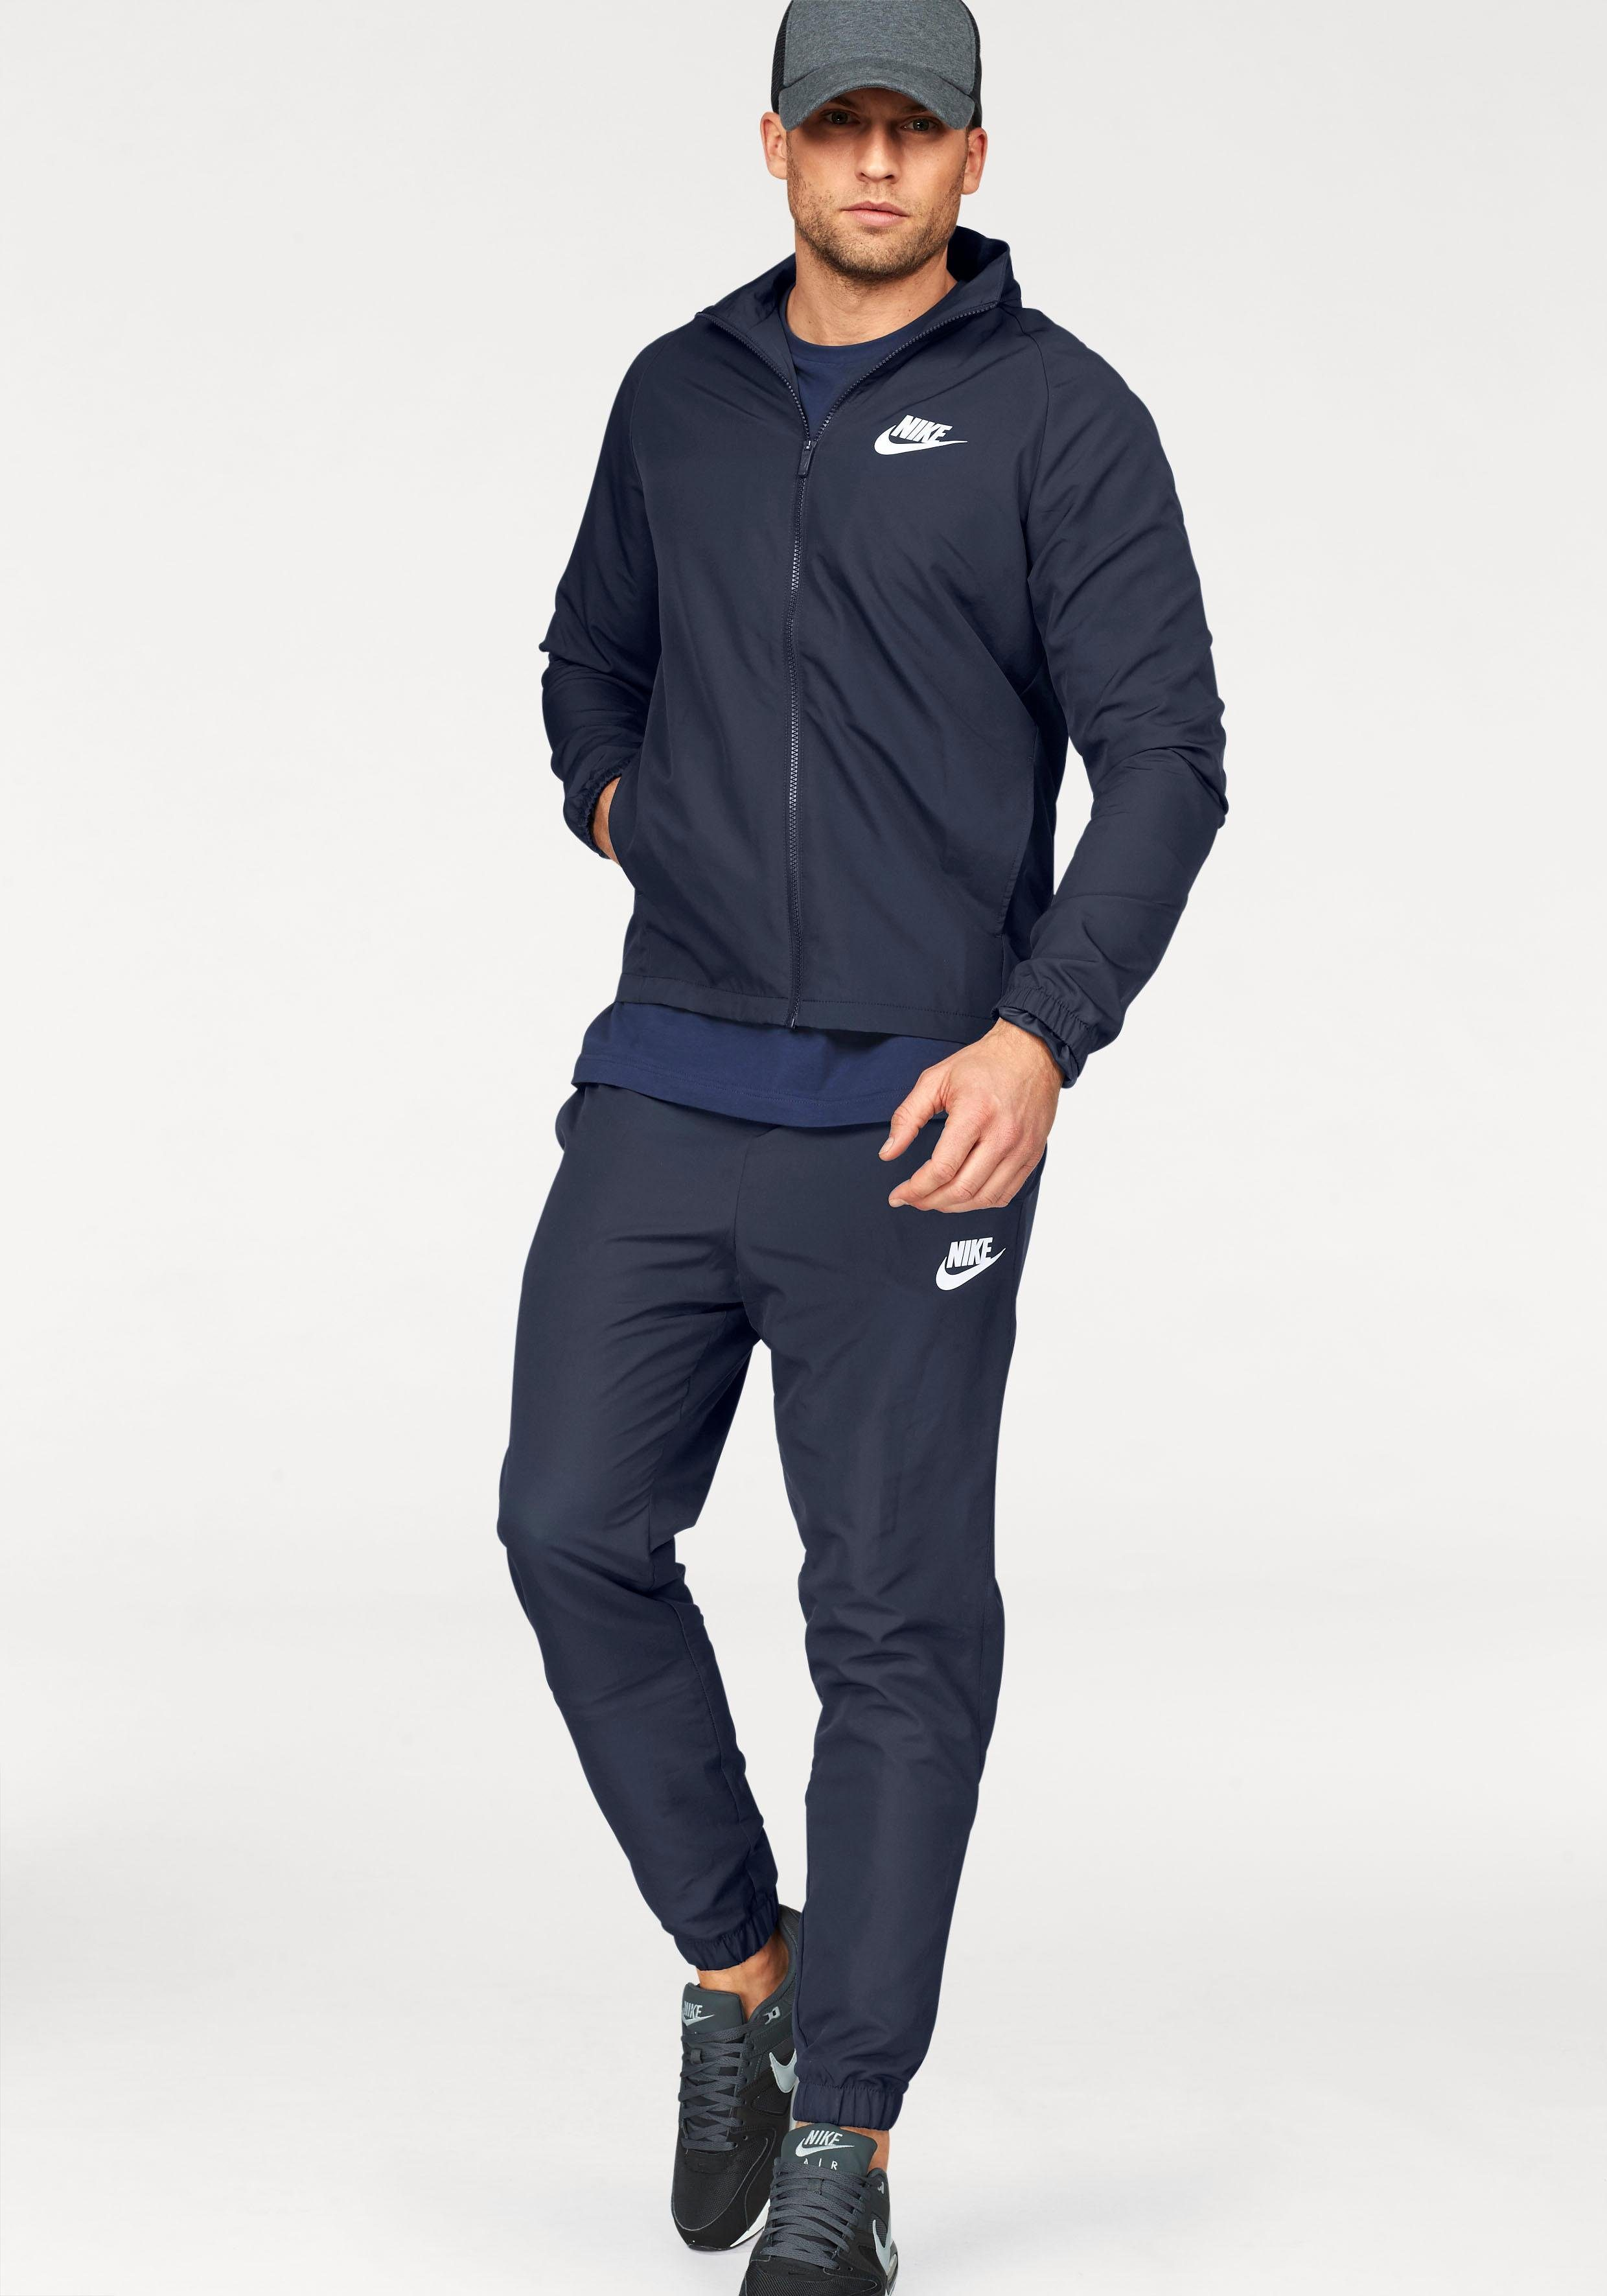 Nike Sportswear Trainingsanzug »TRACK SUIT WOVEN BASIC« (Set, 2 tlg) online kaufen | OTTO